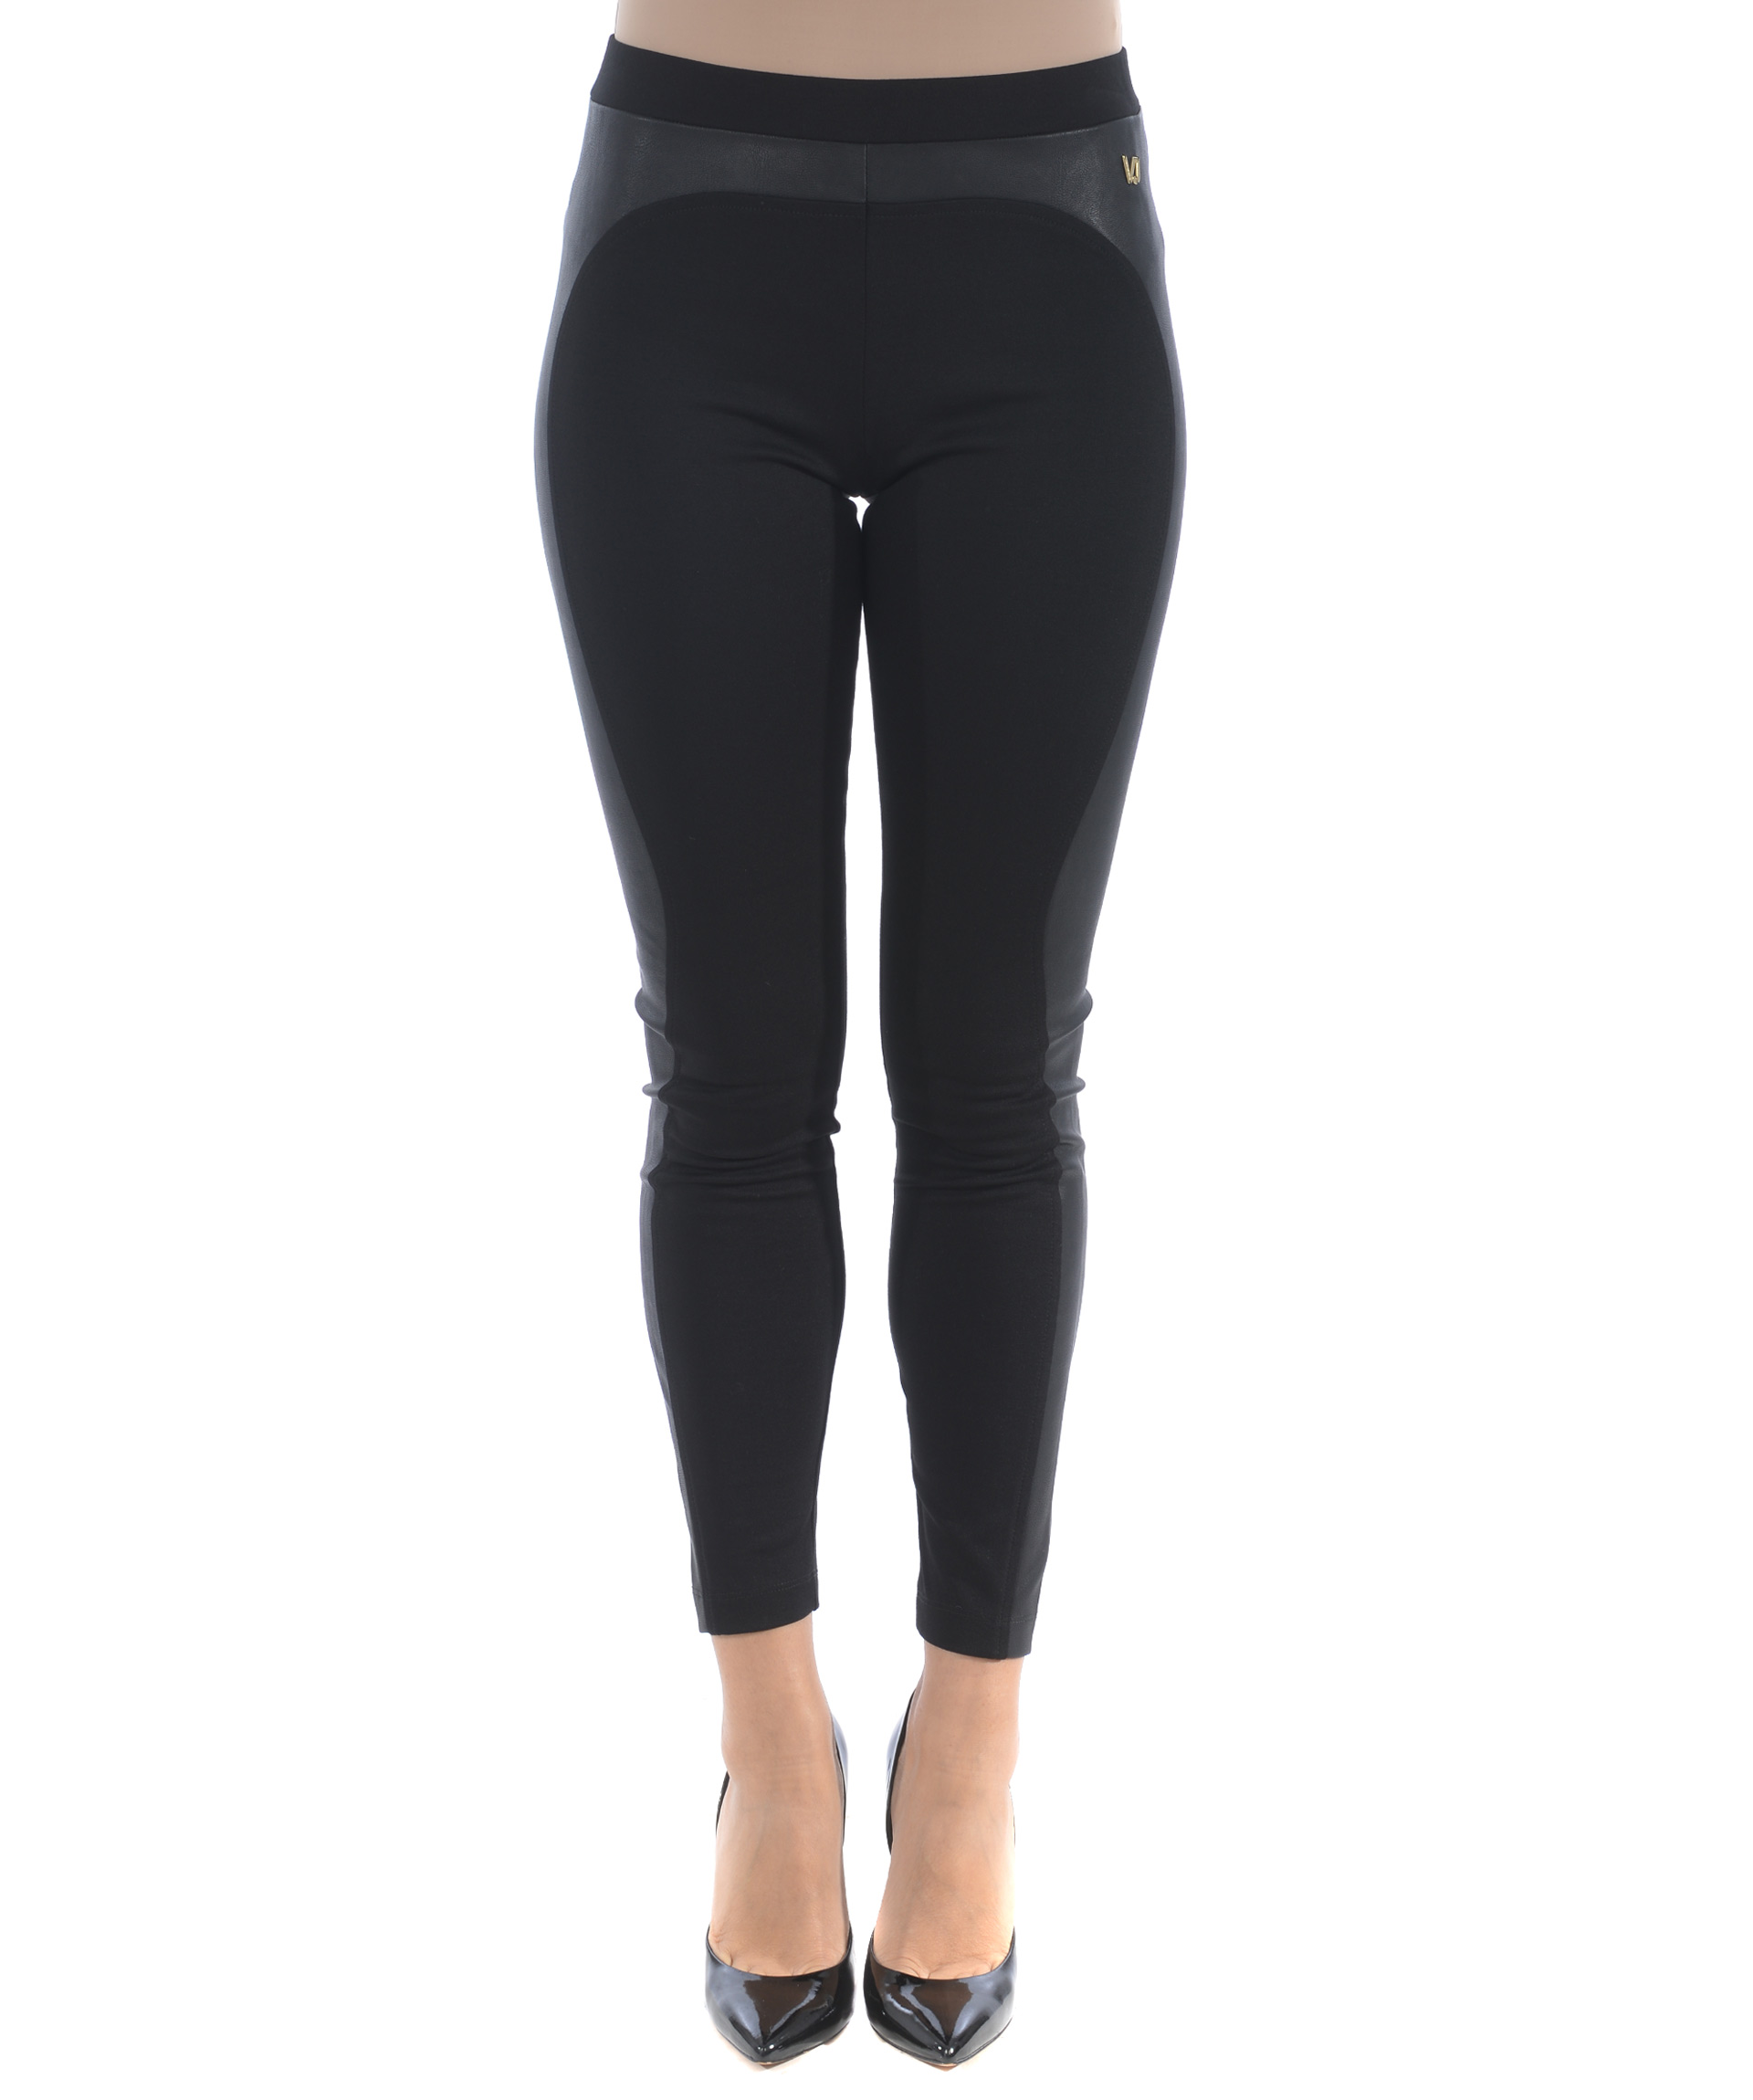 competitive price 9cce2 51212 Pantaloni Versace Jeans